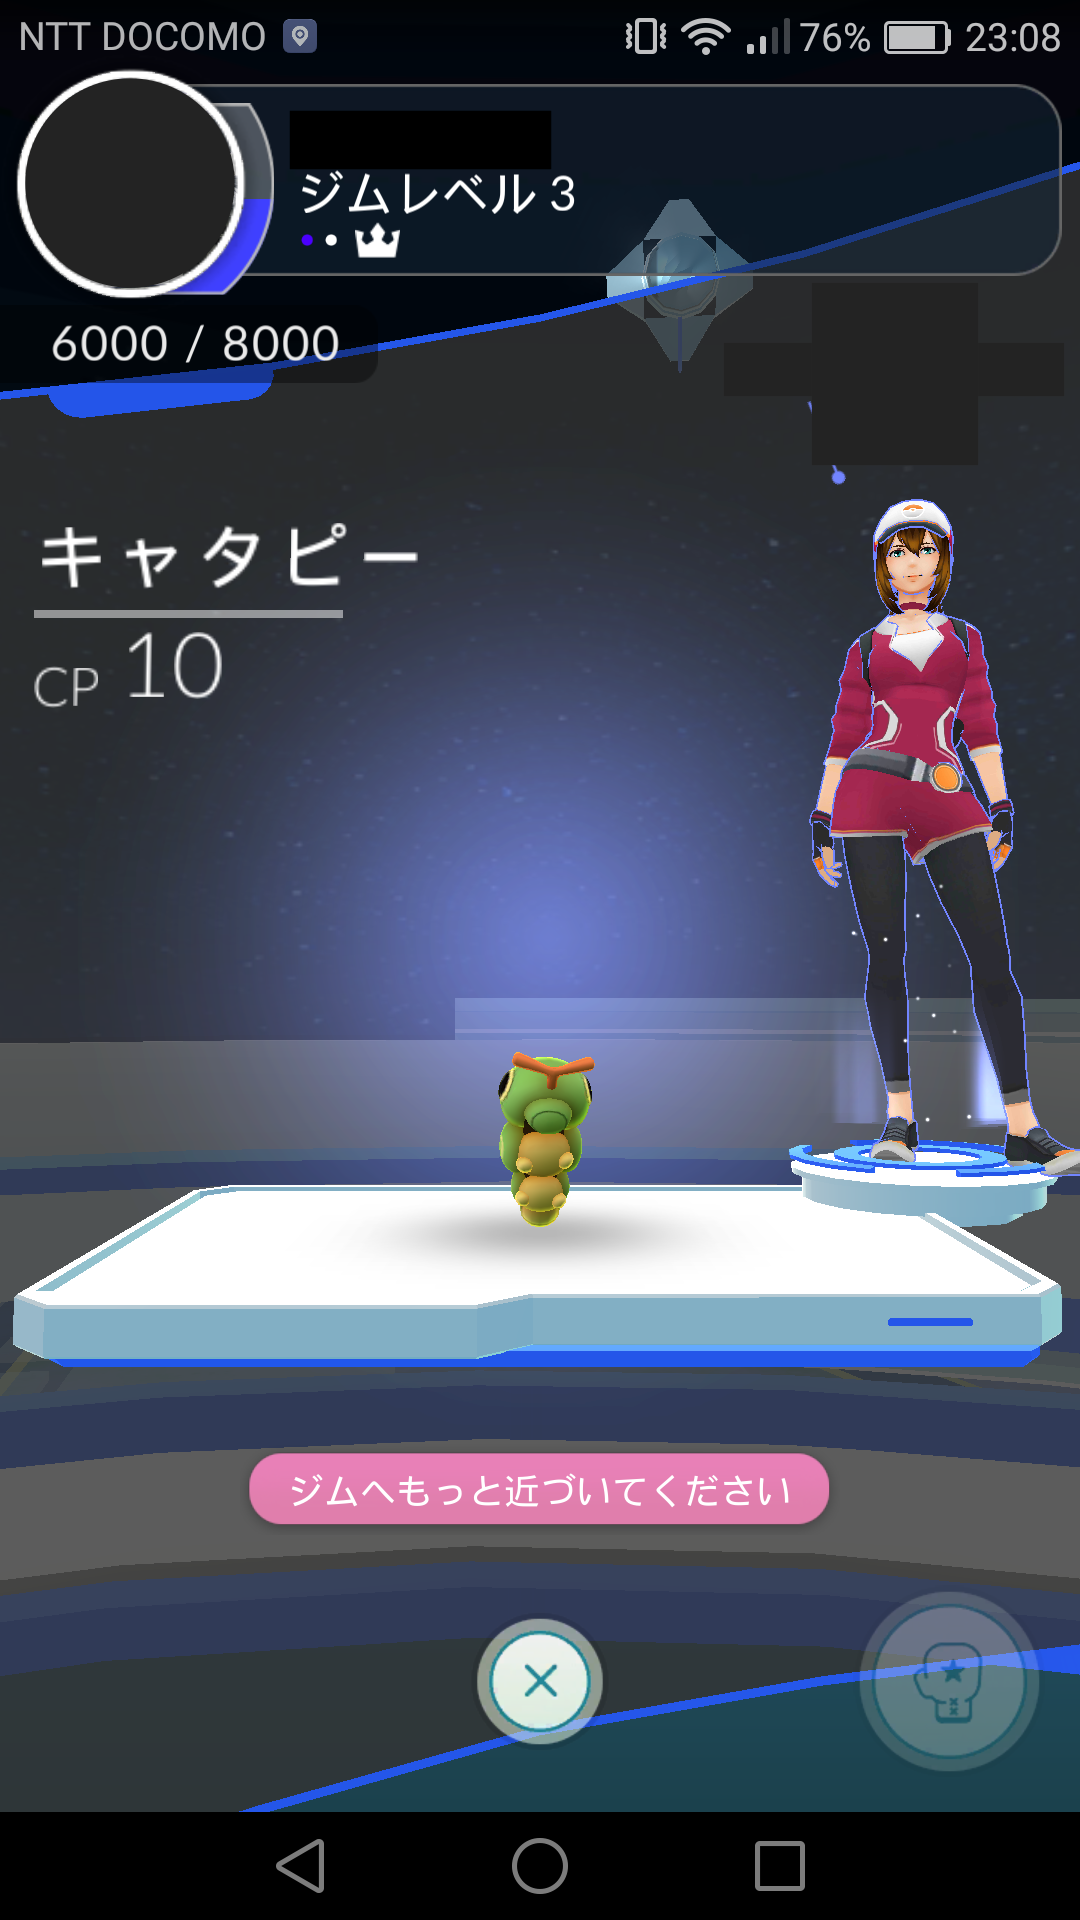 f:id:atsuhiro-me:20160905231640p:plain:w400